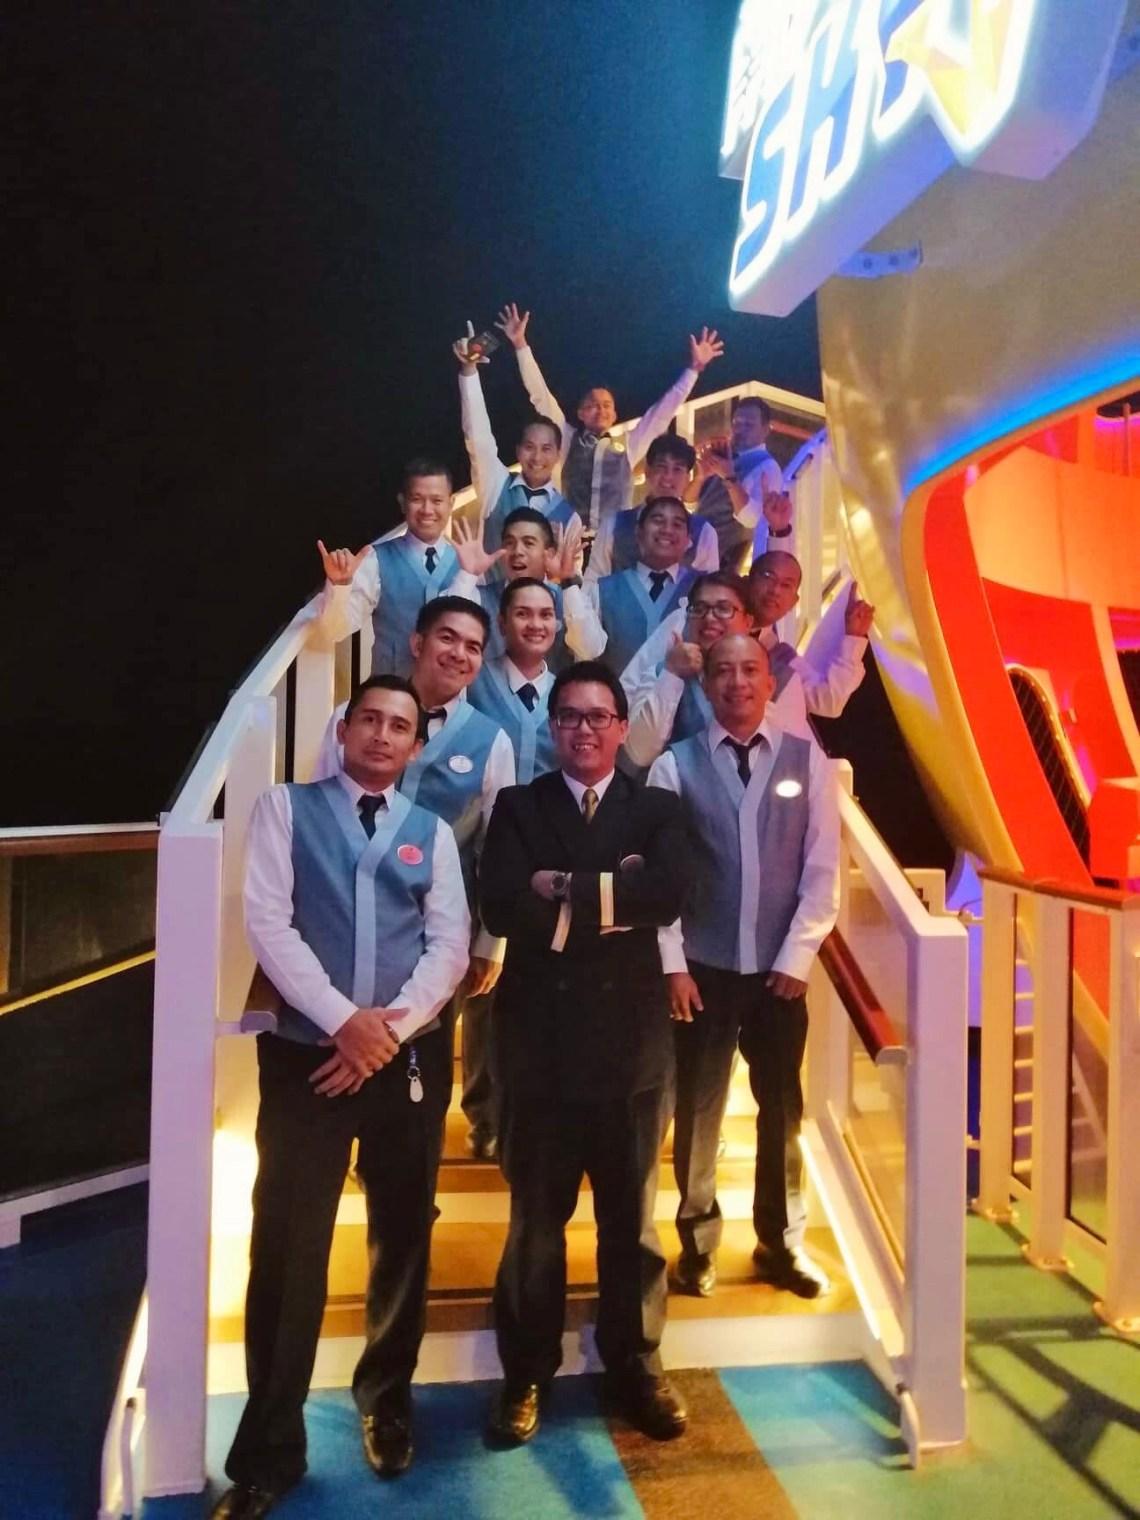 Lowongan Kerja di Kapal Pesiar Royal Caribbean